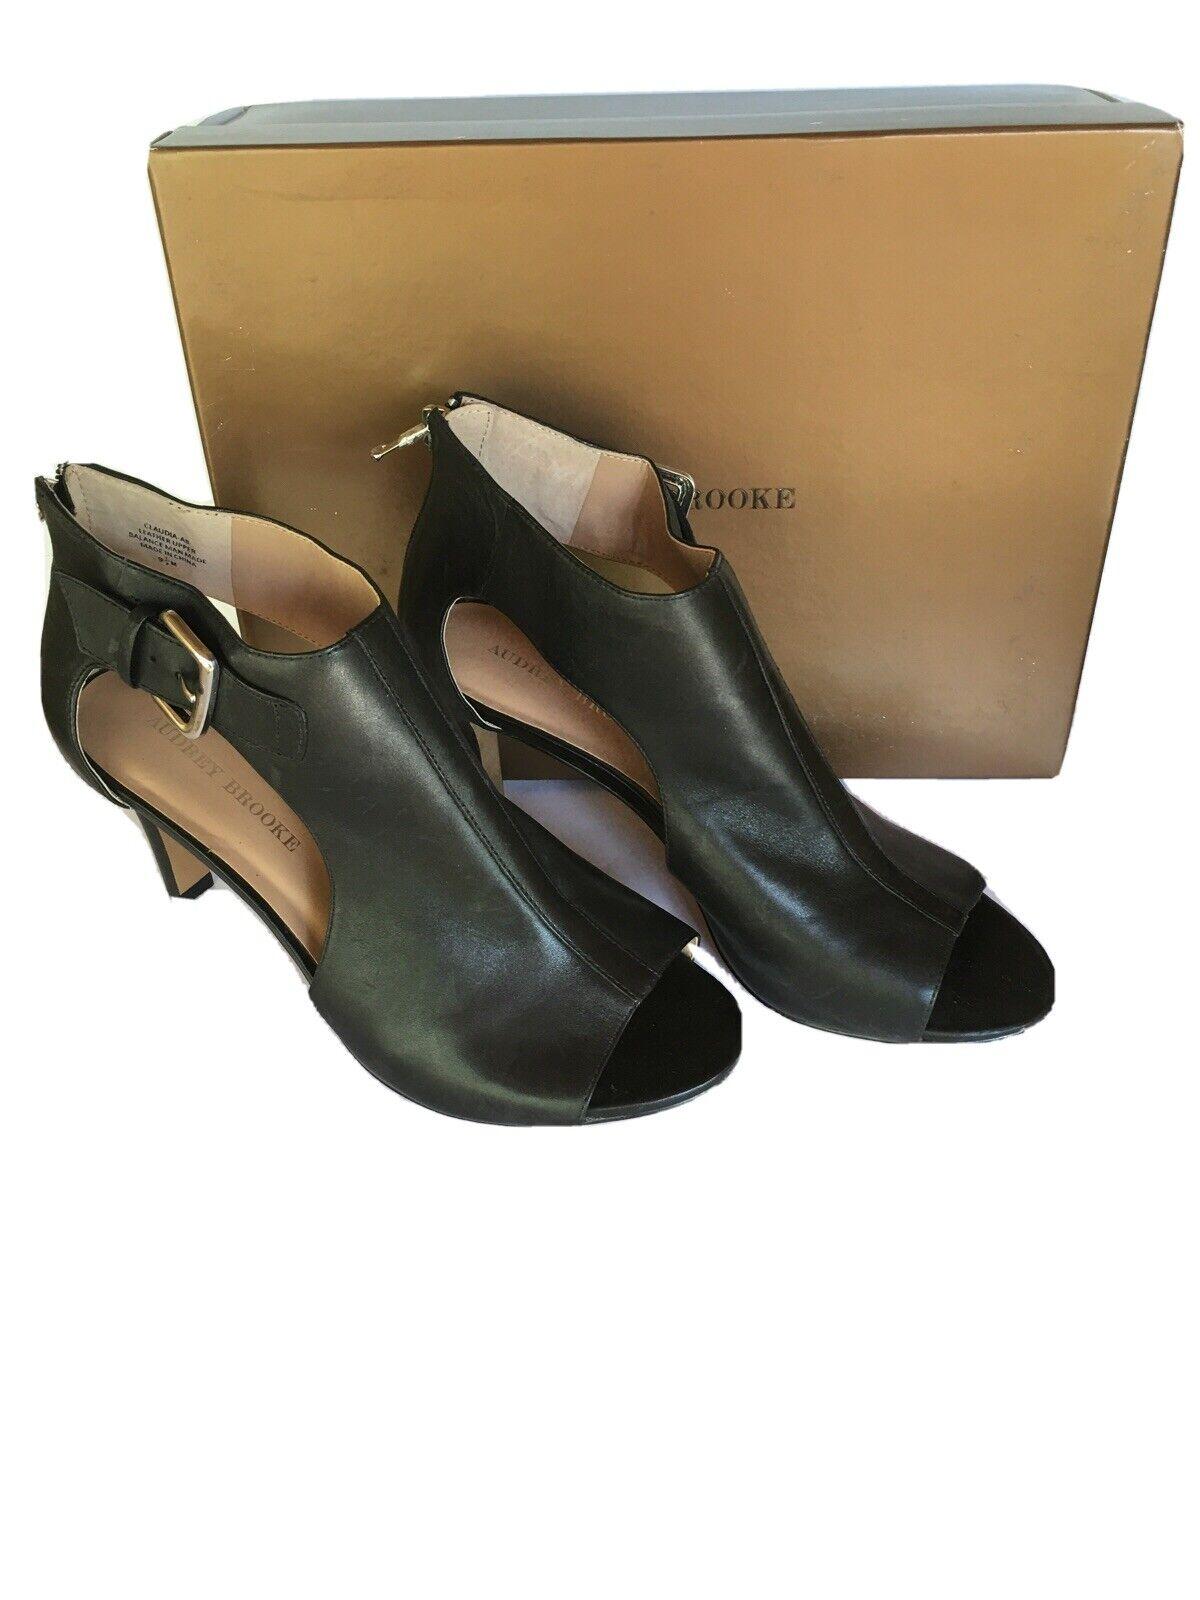 New Womens Audrey Brooke Zipper Back Black High Heels Shoes Size 9.5